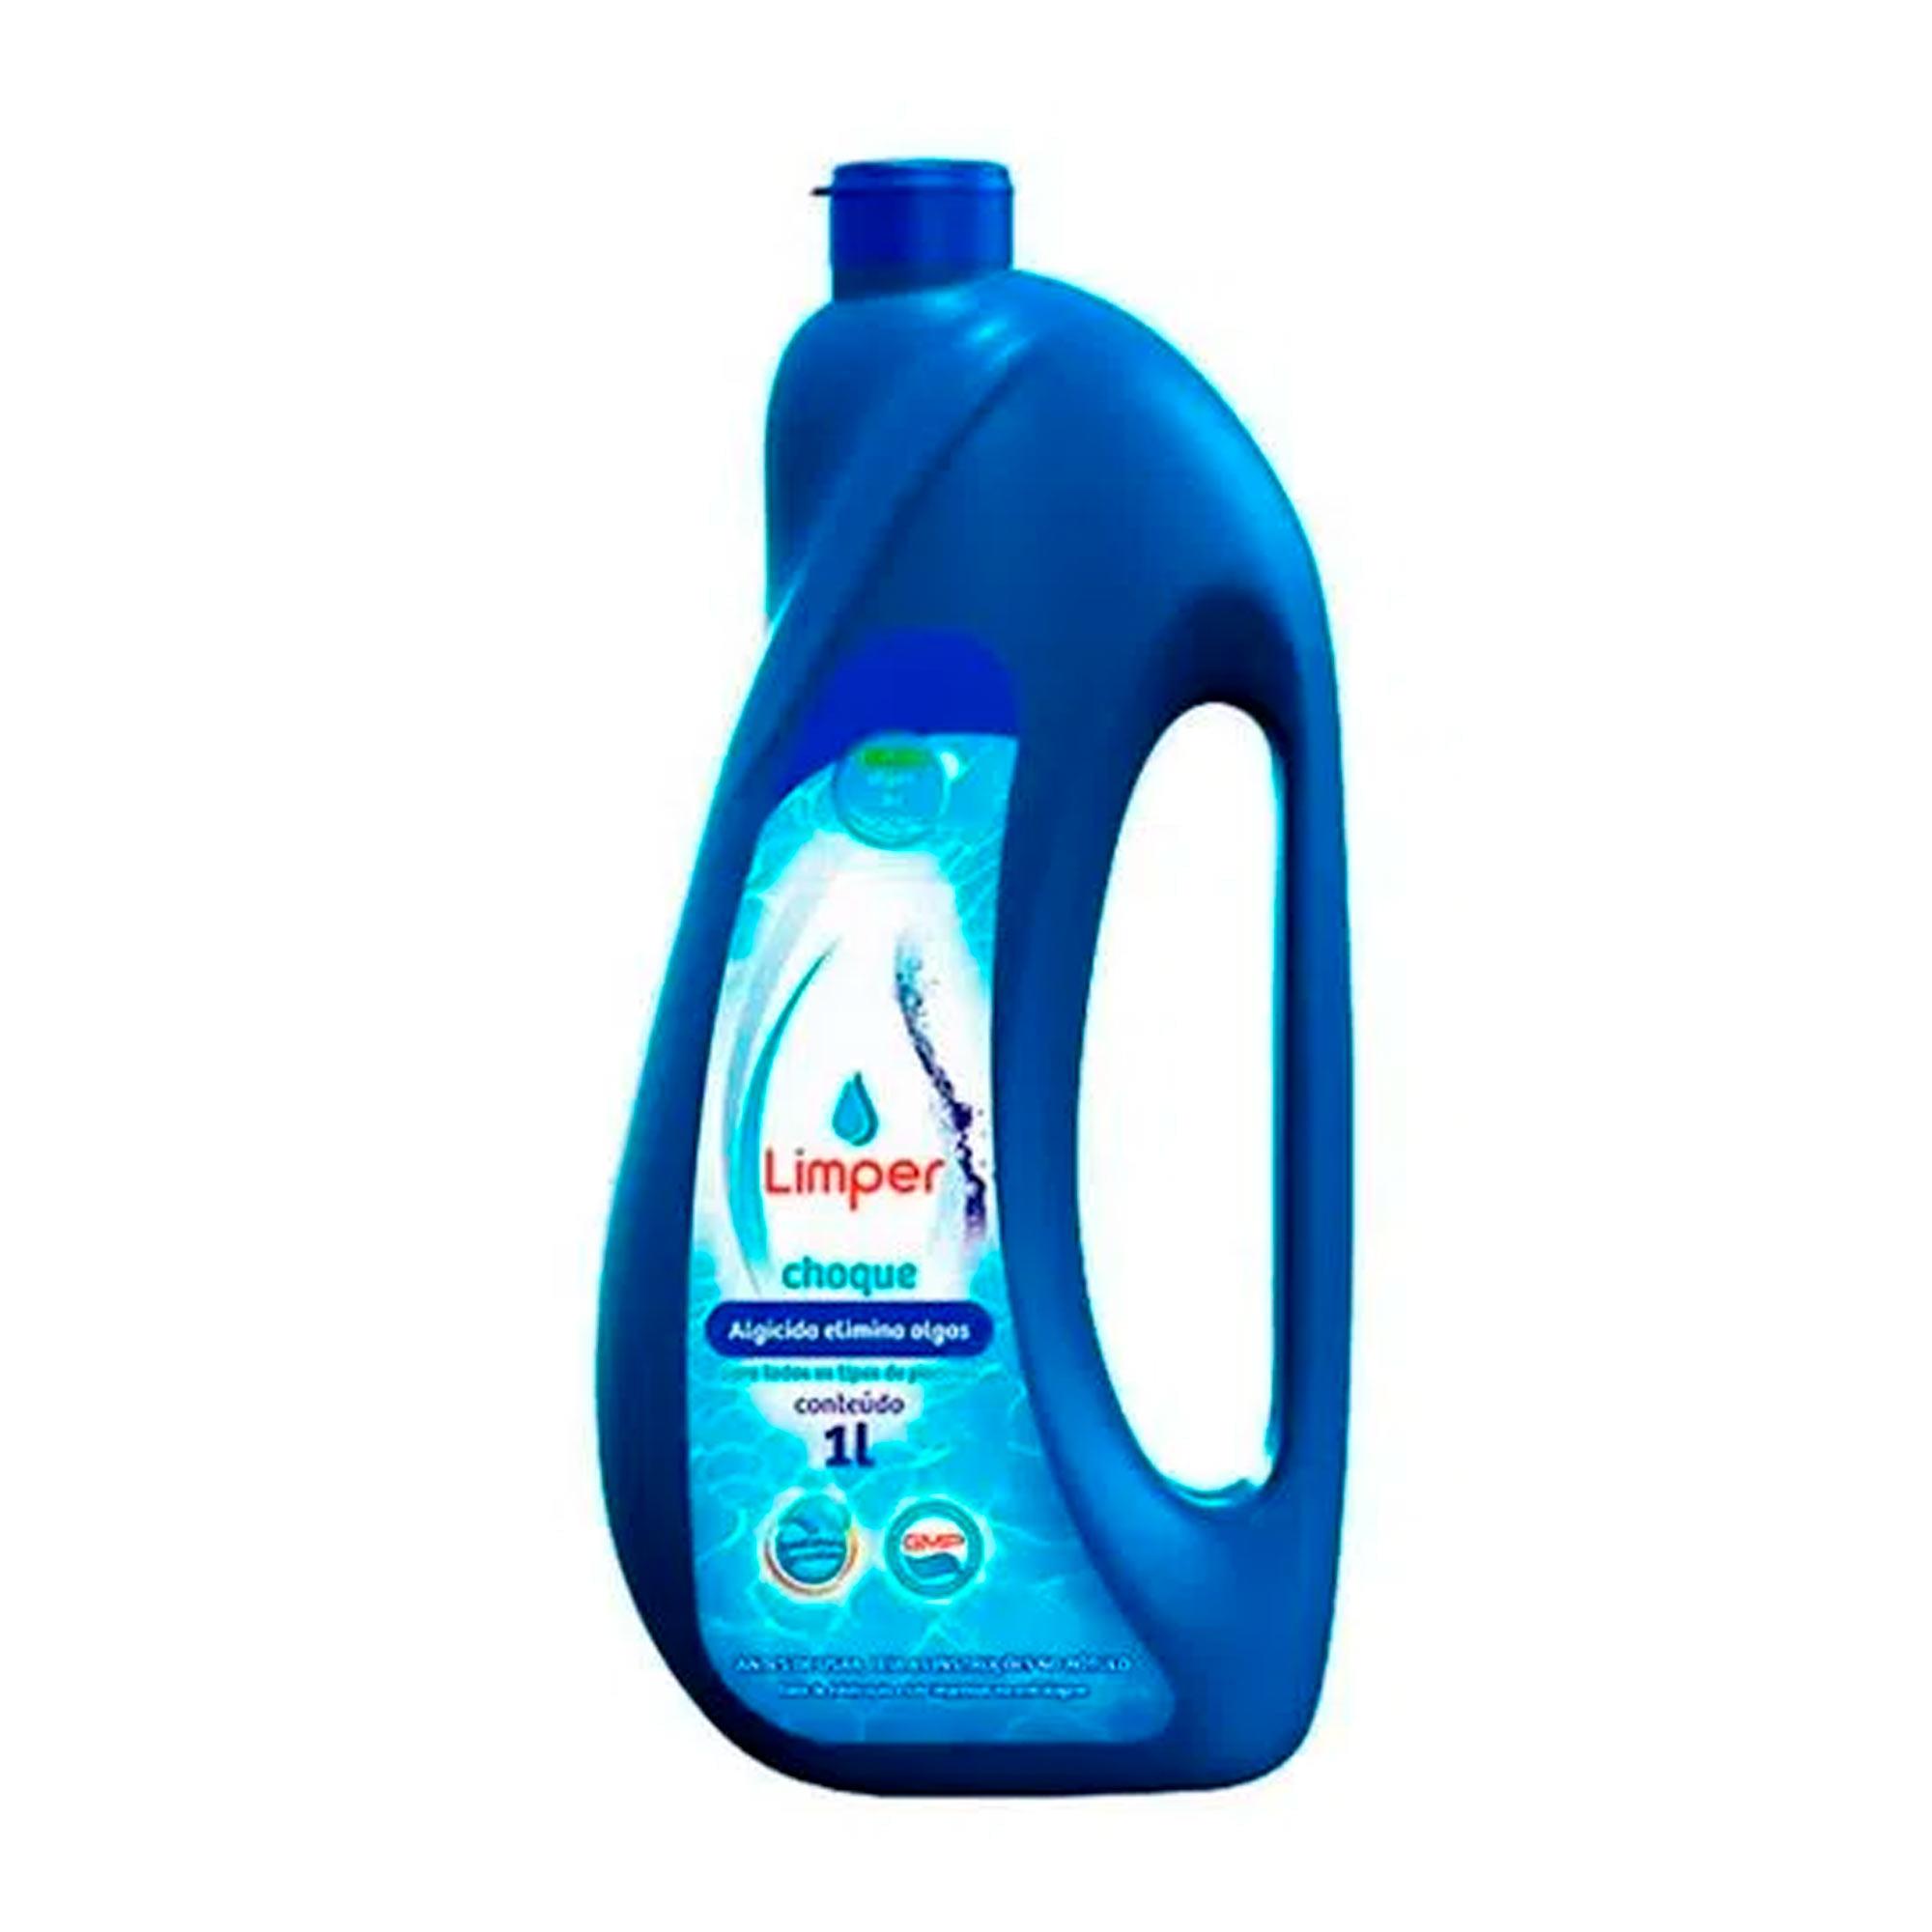 Algicida Atcllor Limper Choque 1 Litro